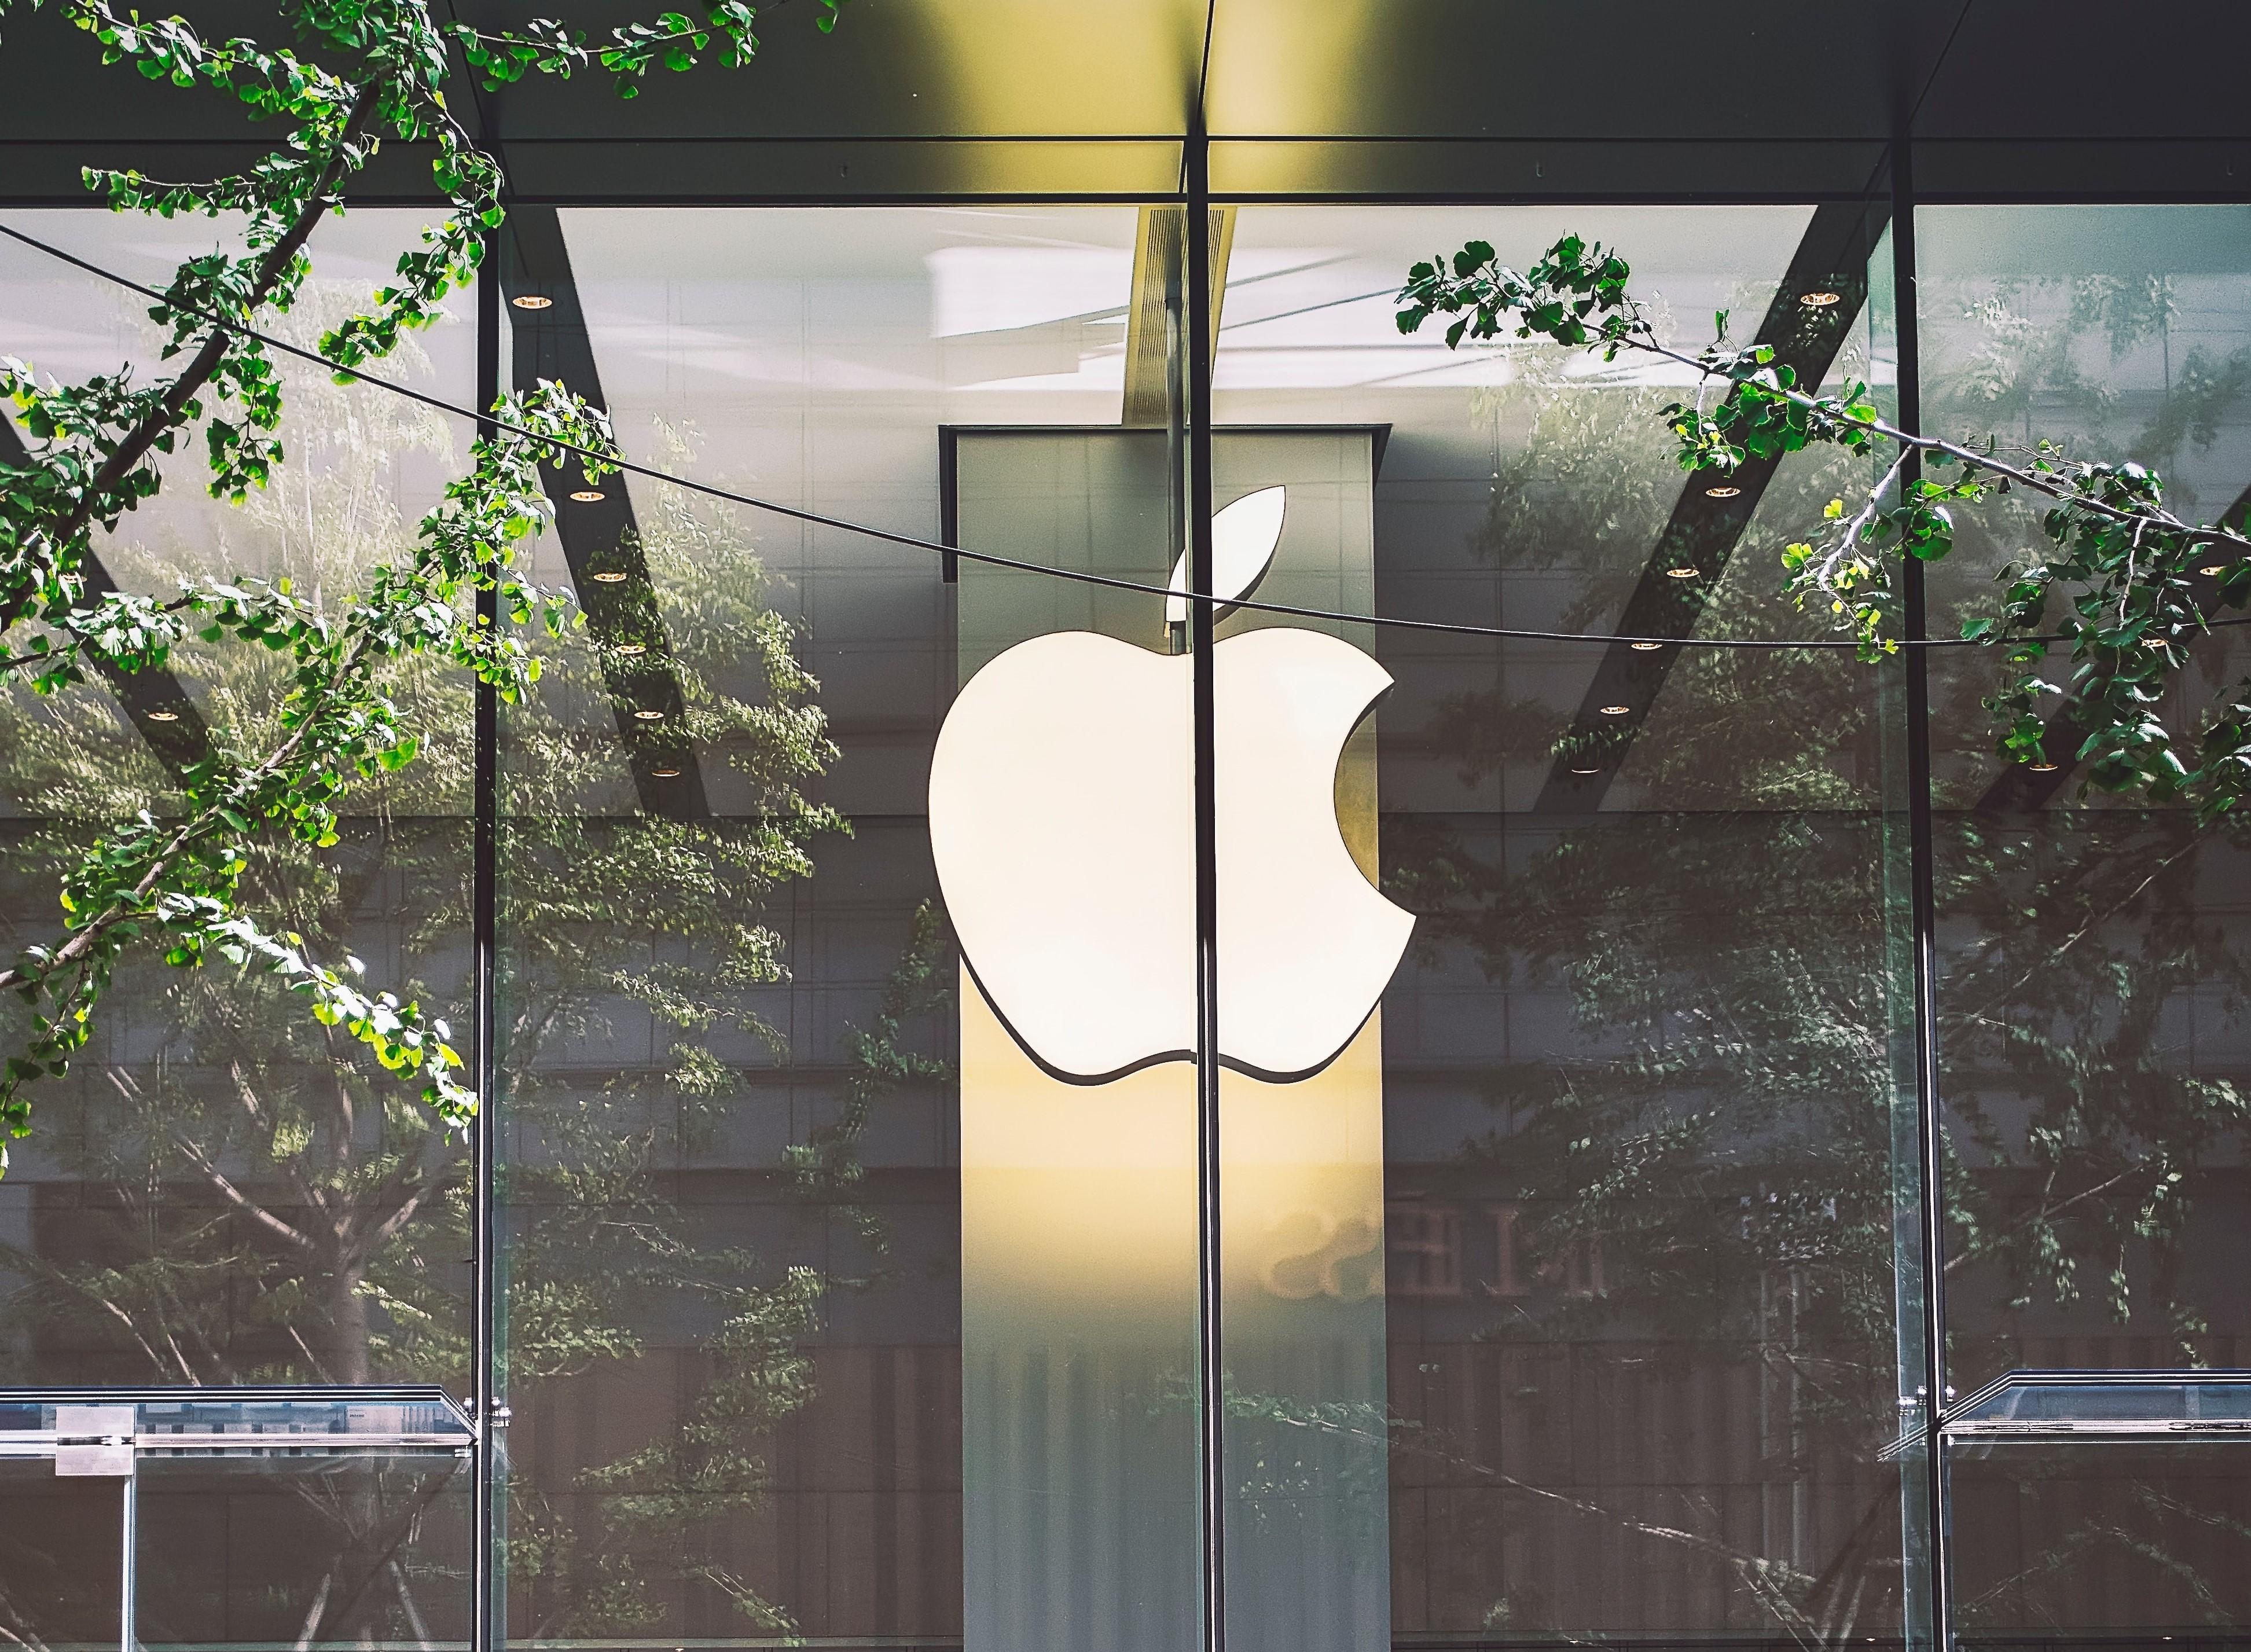 Nebenjobs bei Apple